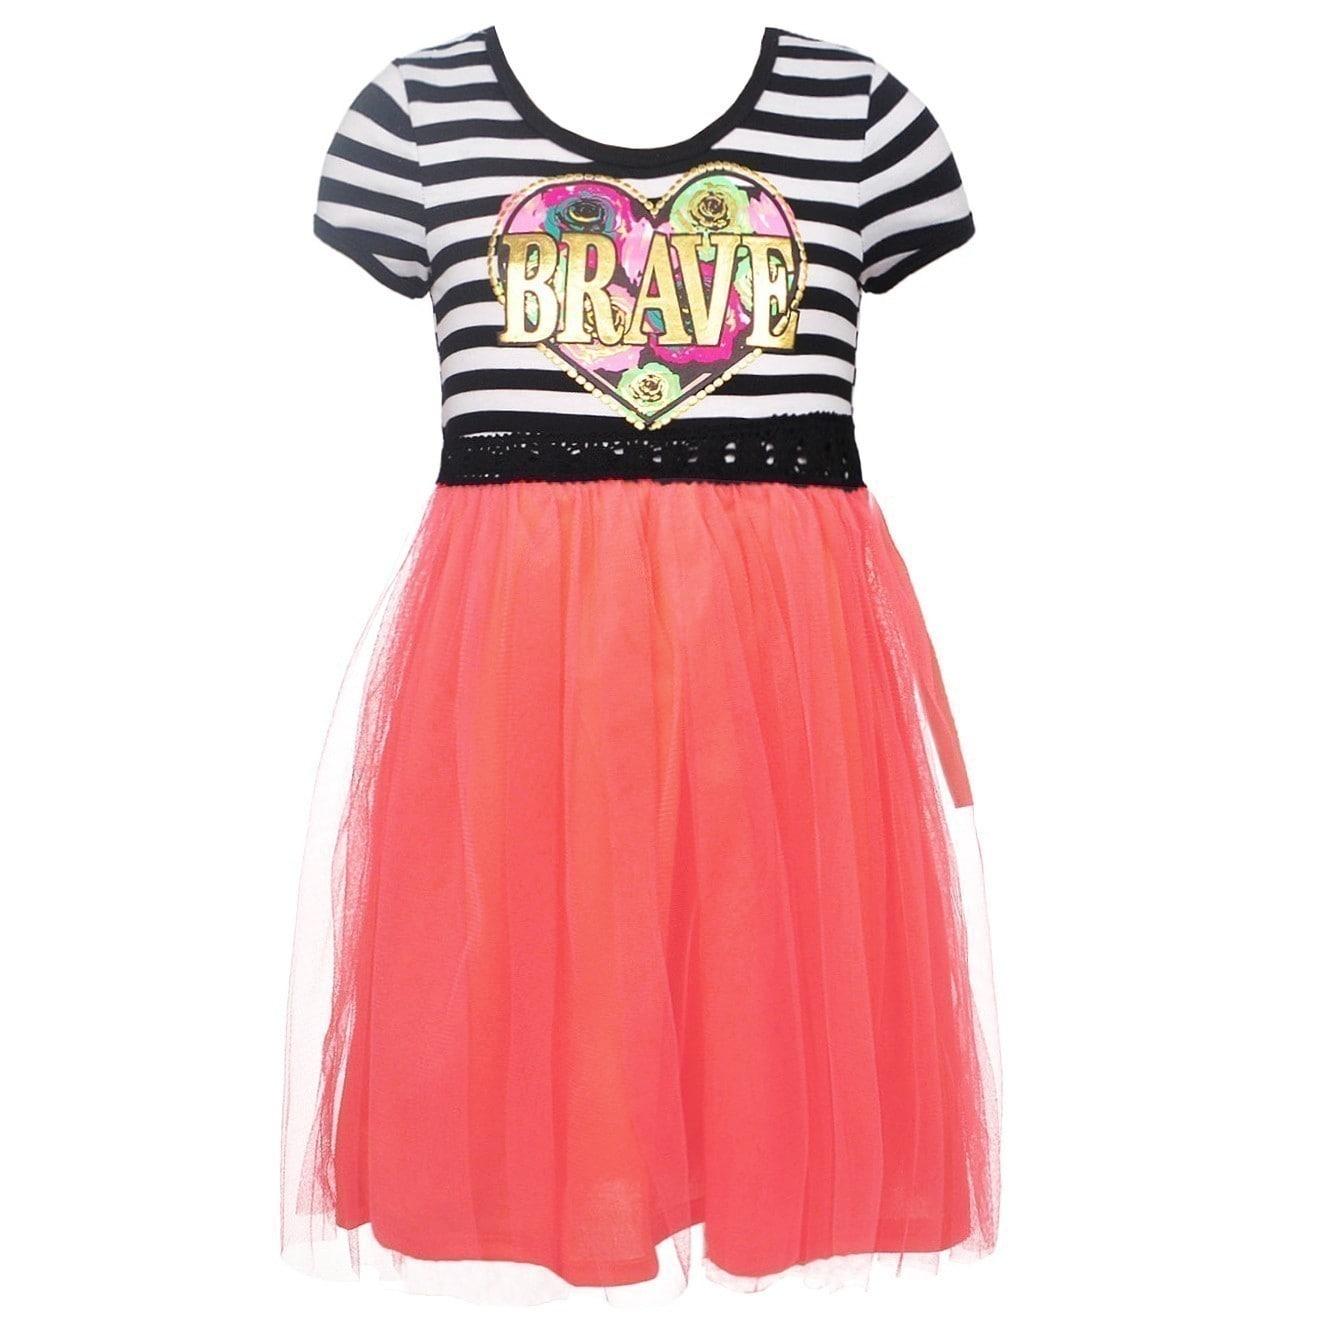 09330d6b8 Buy Girls  Dresses Online at Overstock